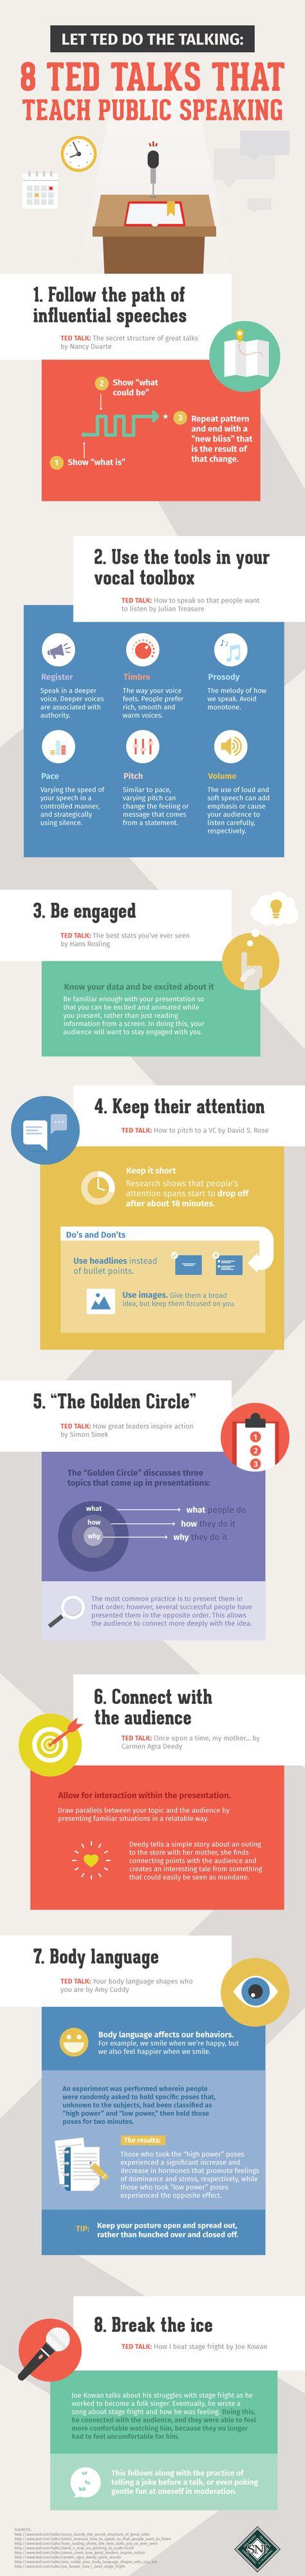 8 Ted Talks That Teach Public Speaking #infographic #PublicSpeaking